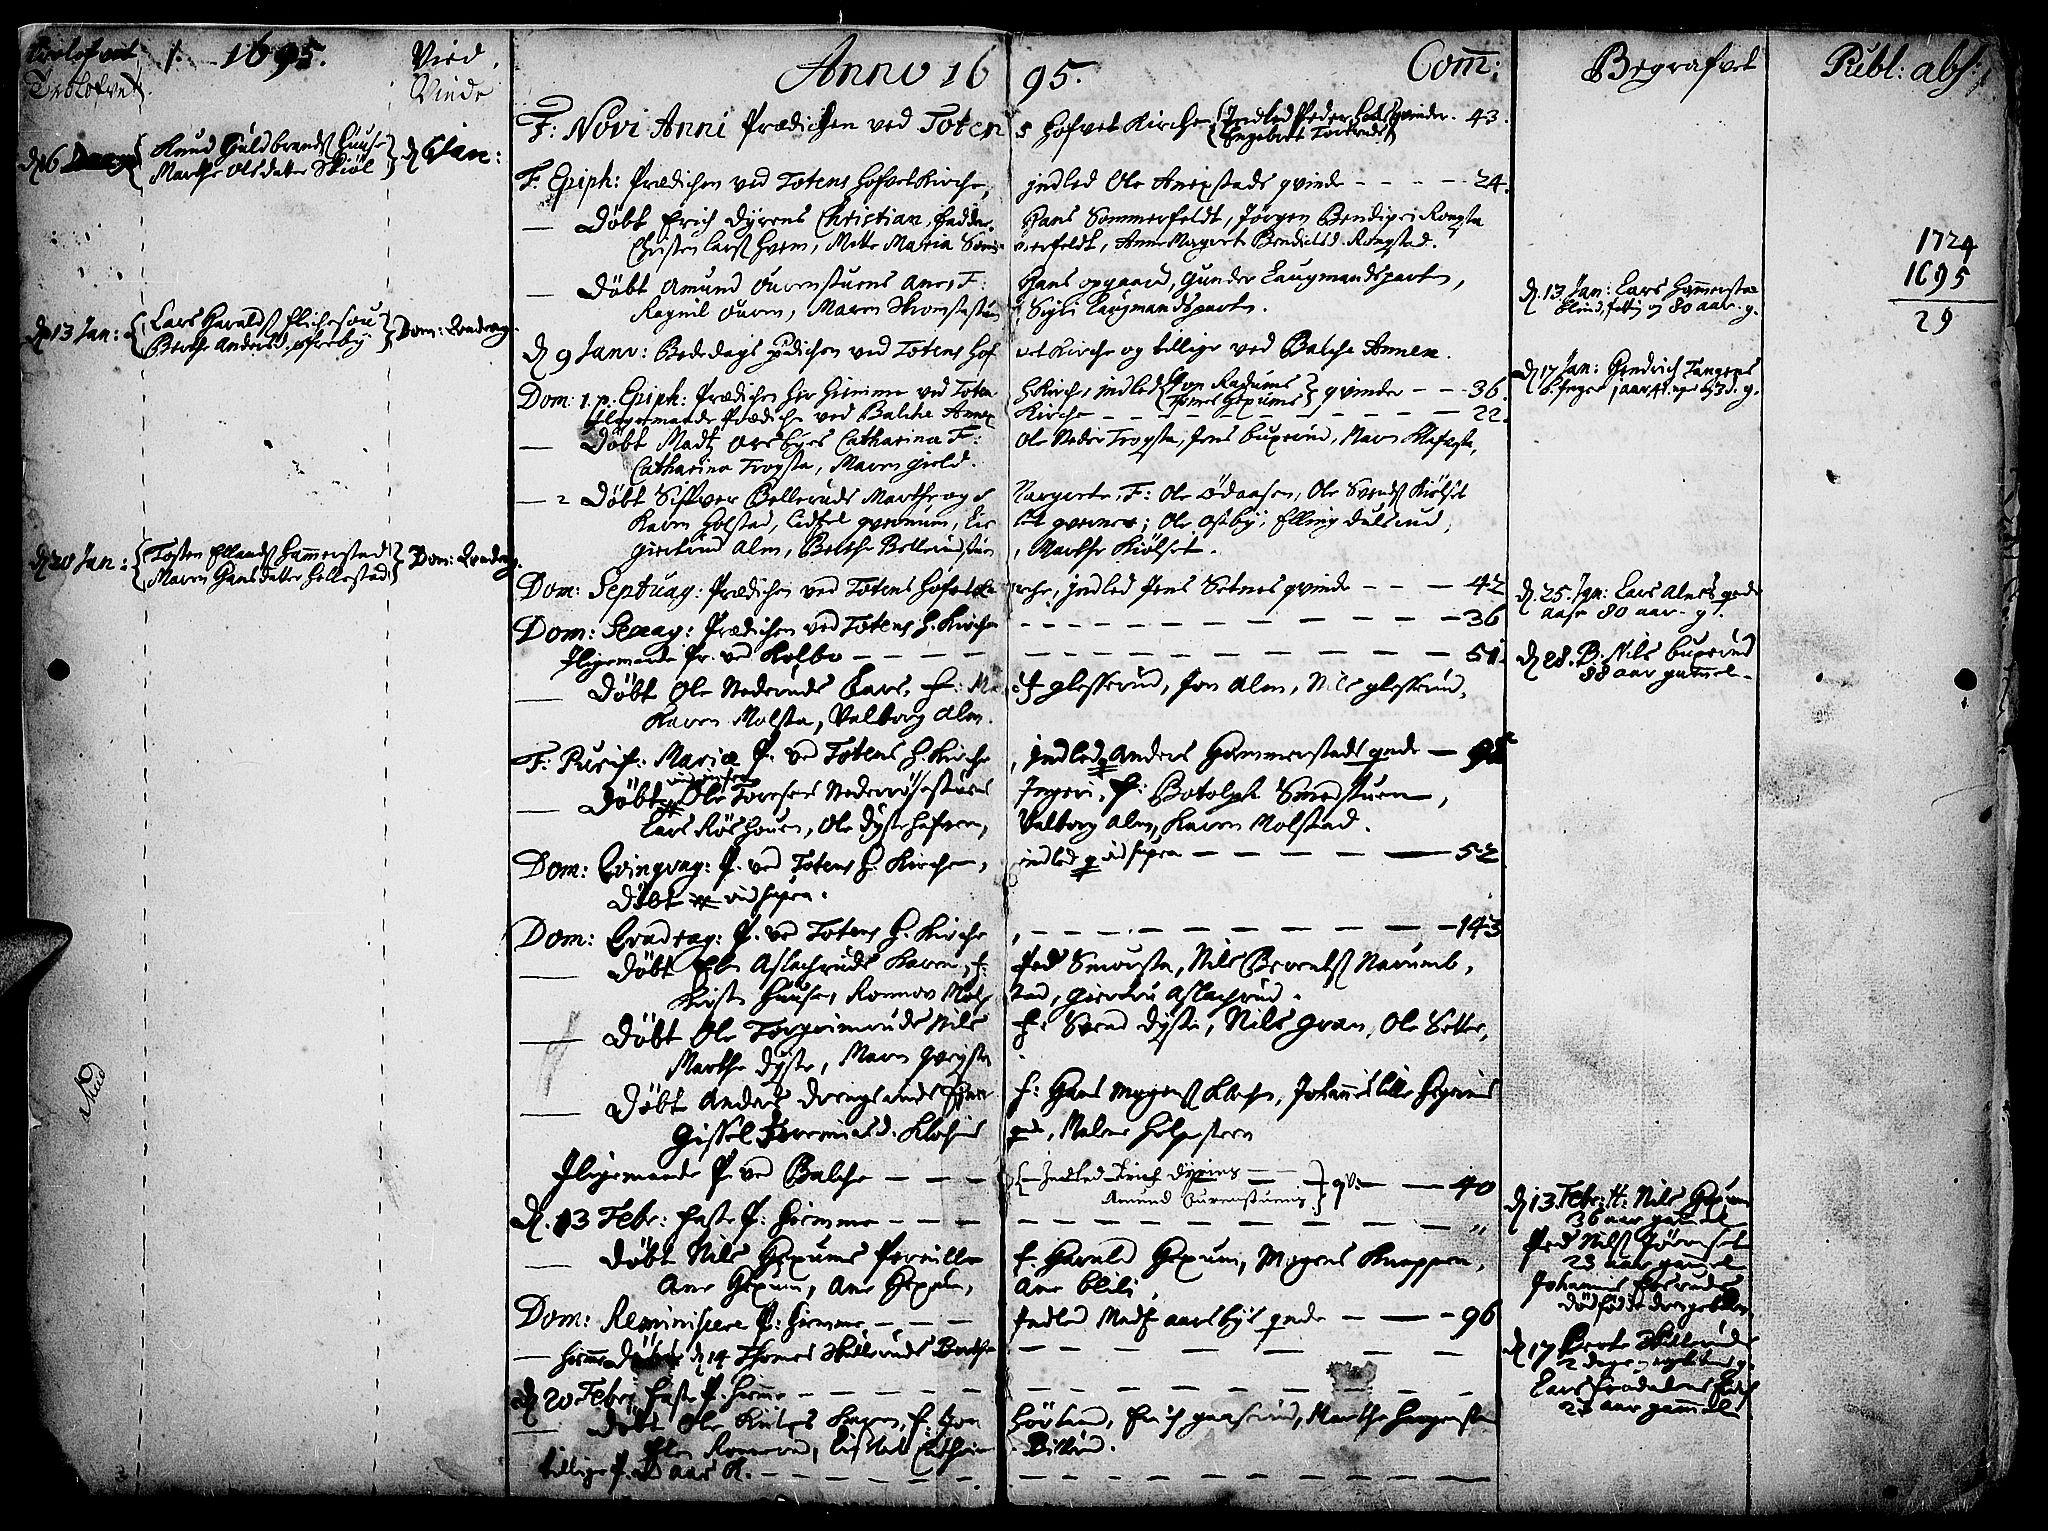 SAH, Toten prestekontor, Ministerialbok nr. 1, 1695-1713, s. 1